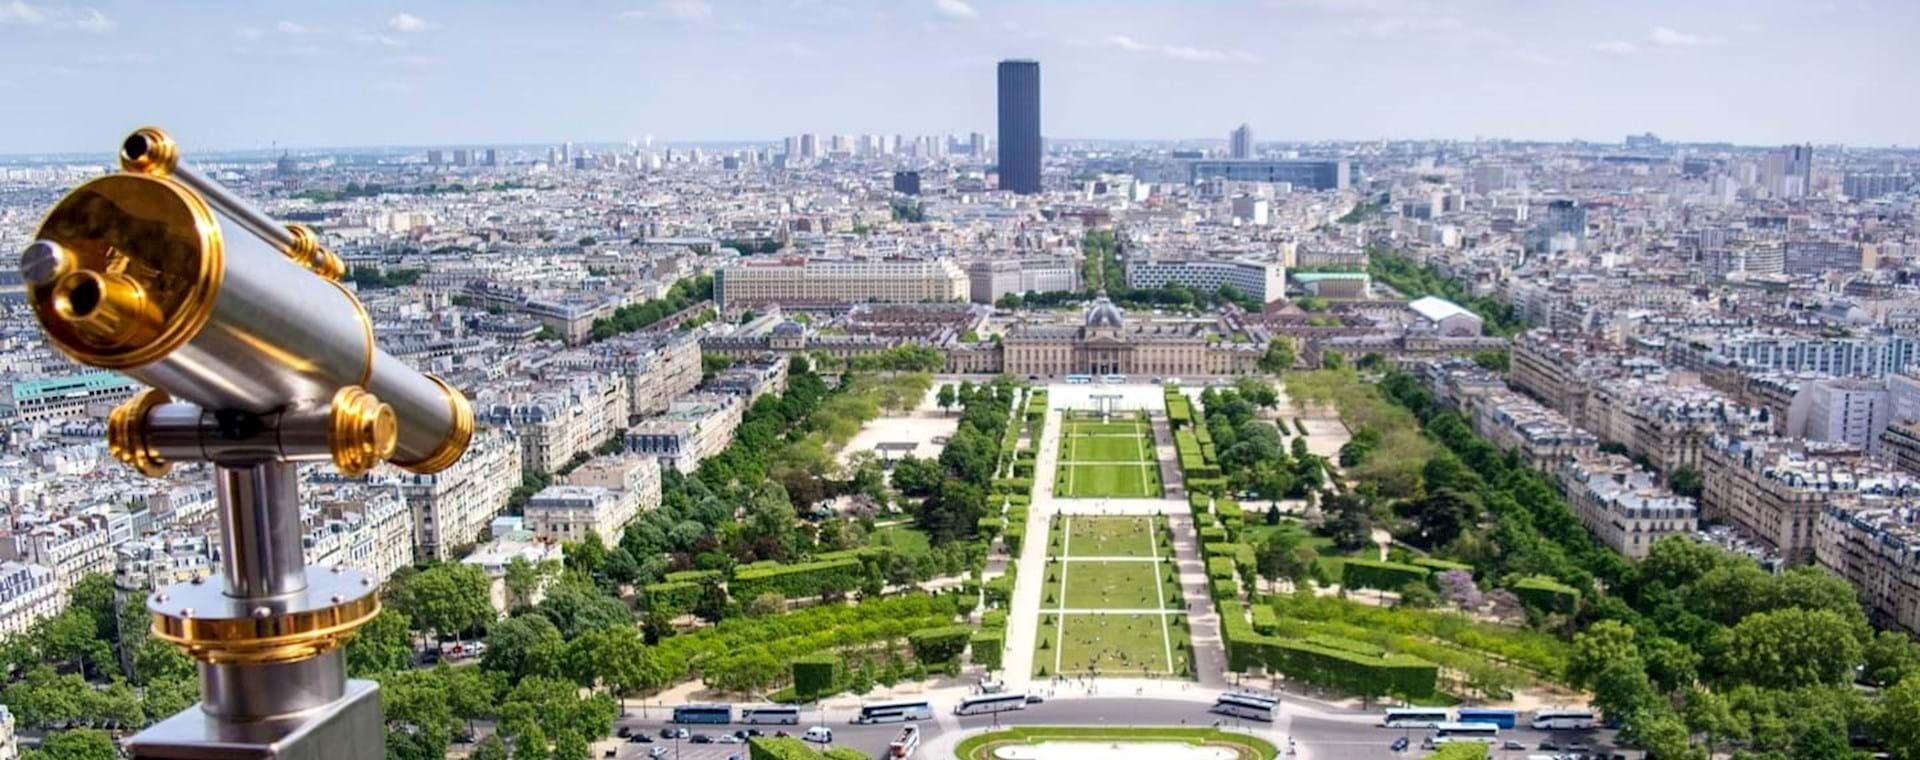 Subida a la Torre Eiffel